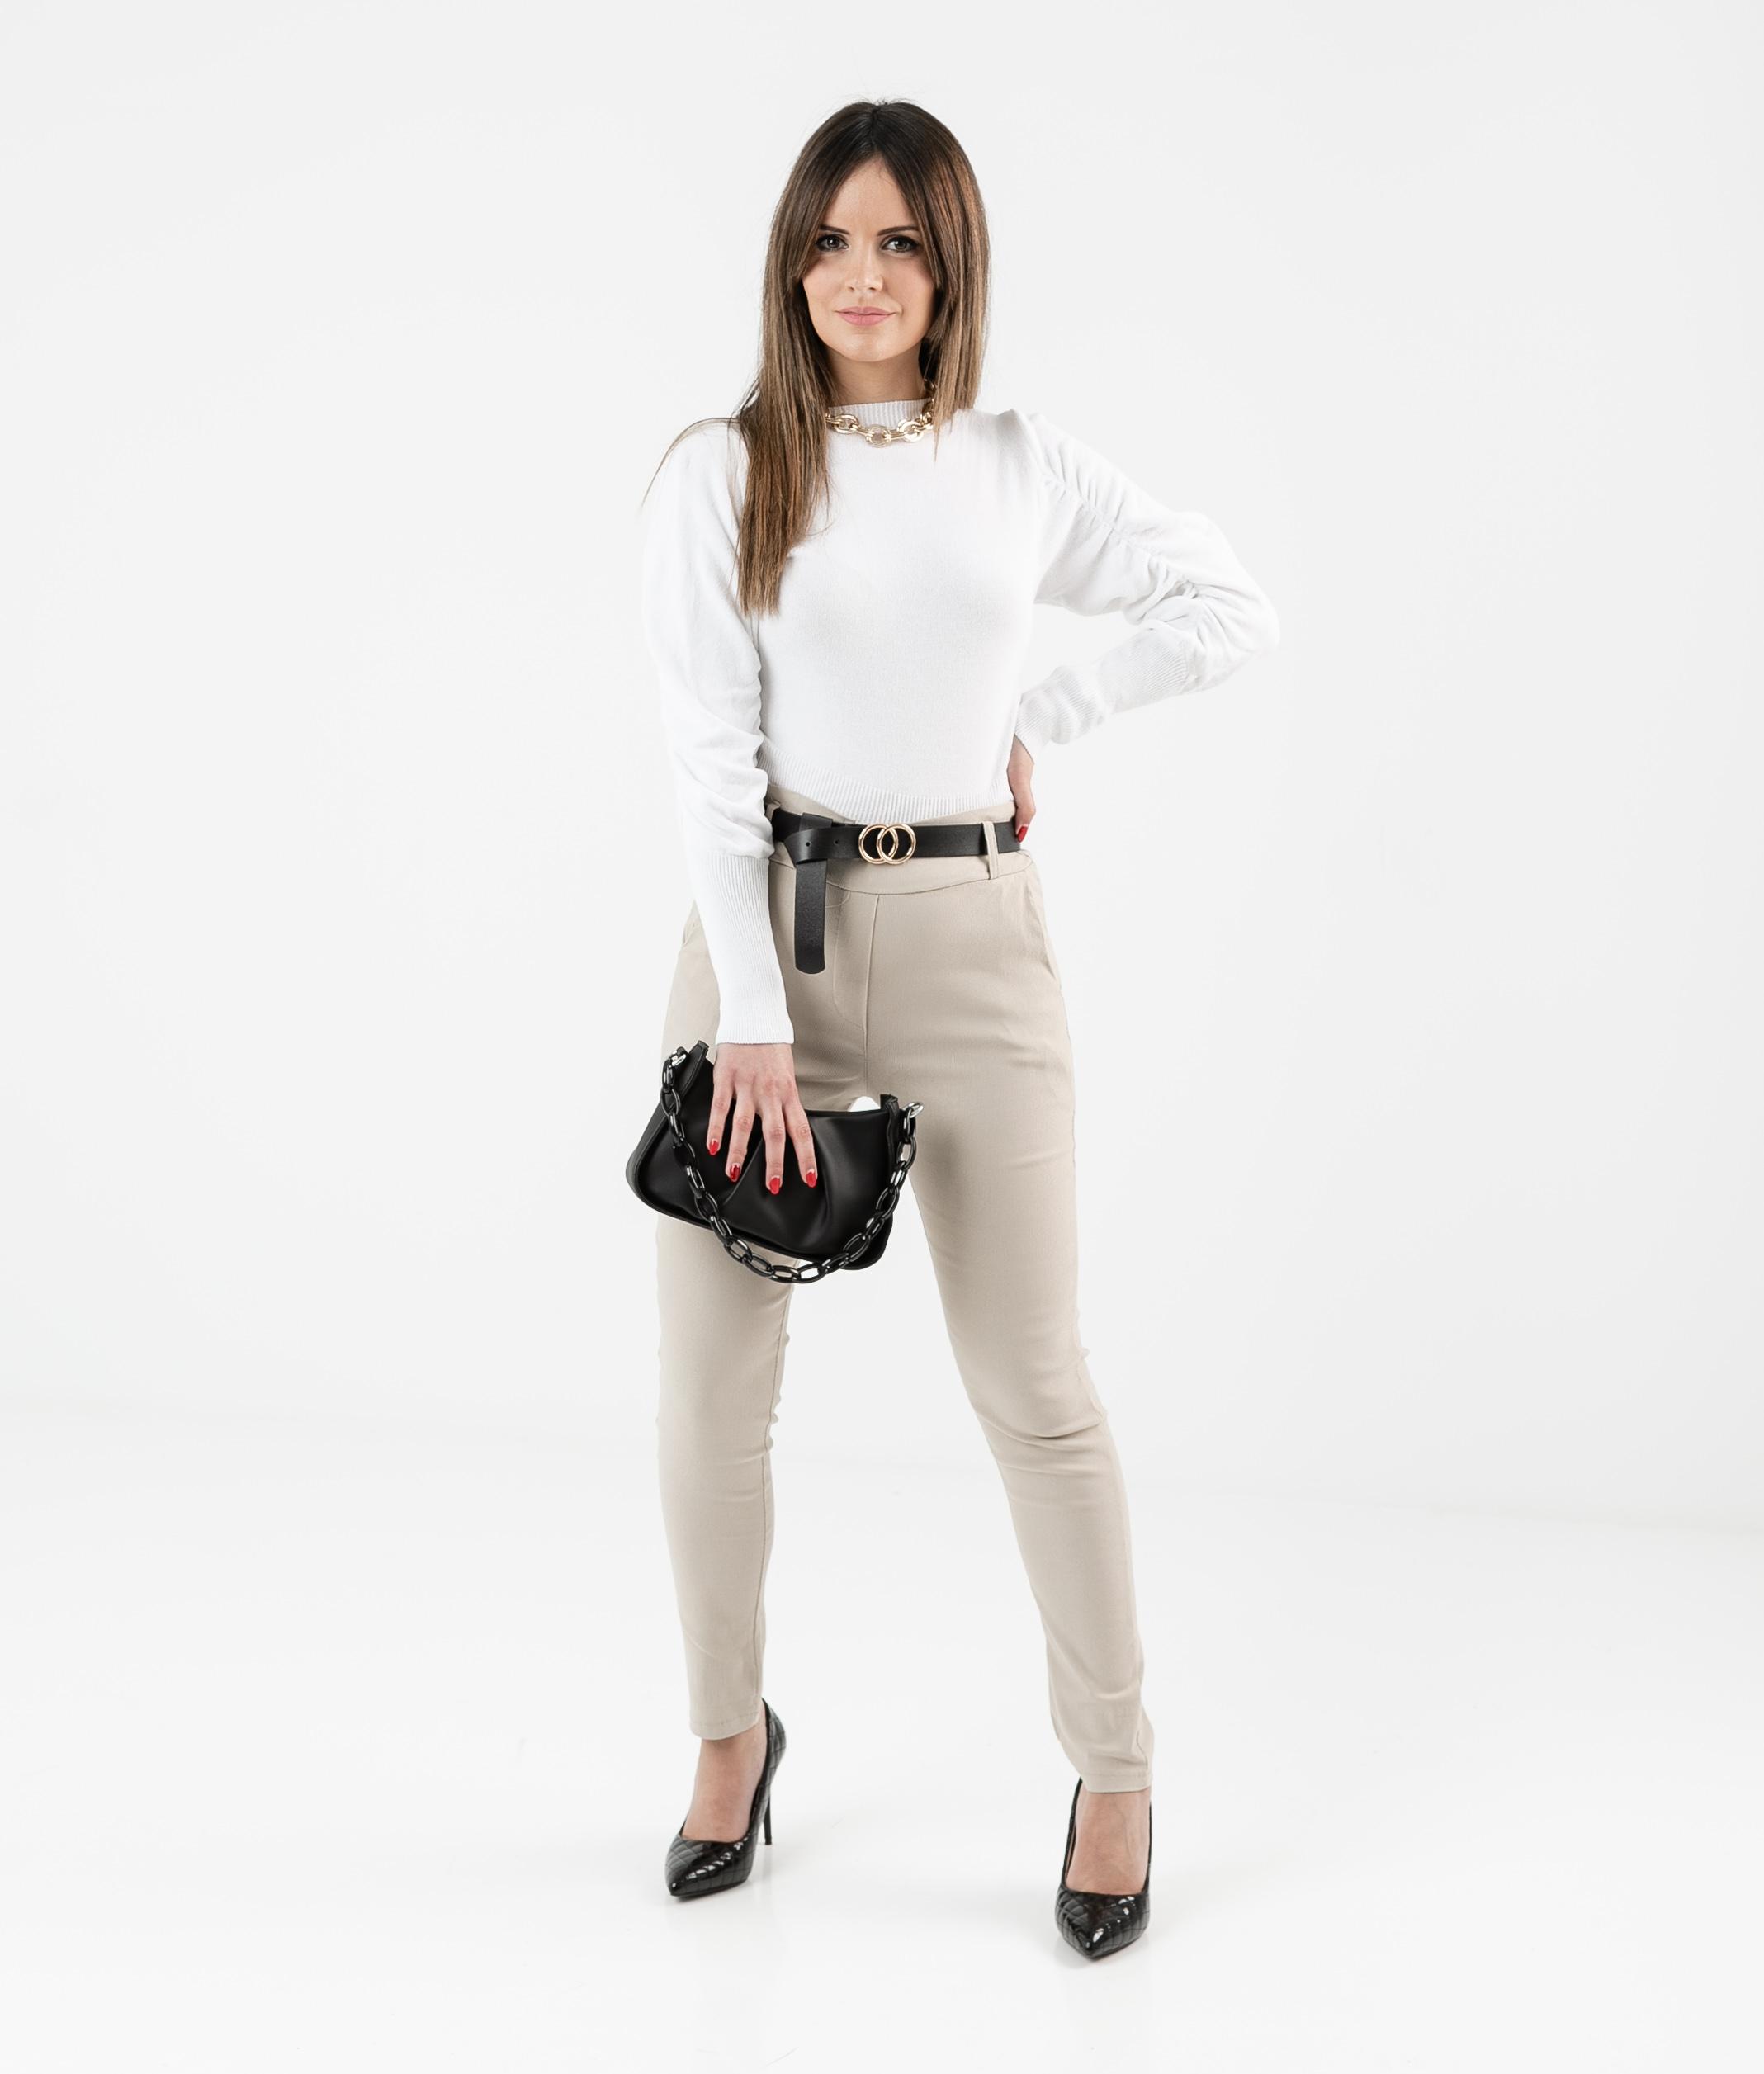 Pantaloni Adriel - Beige